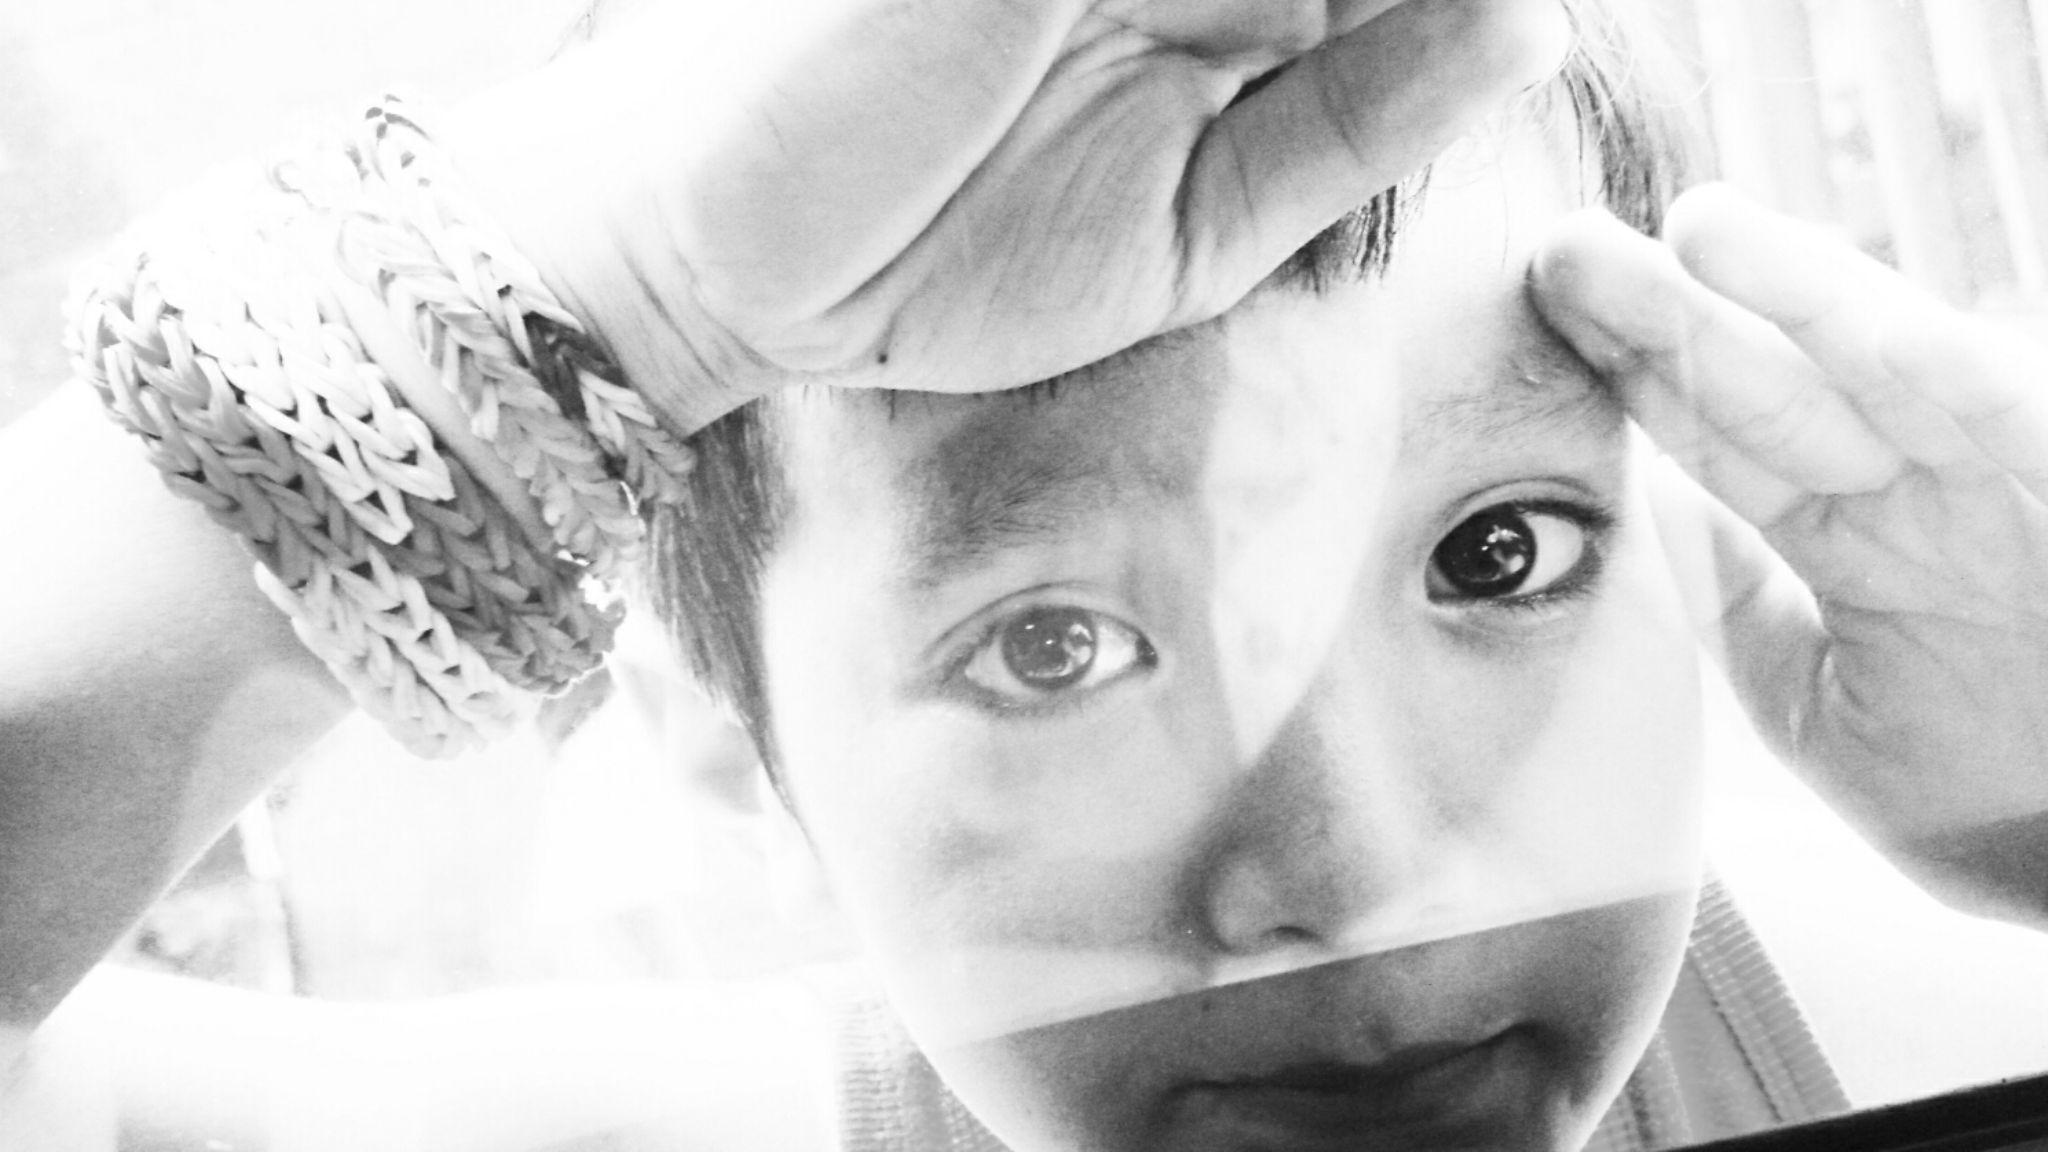 Street kid by XQMe